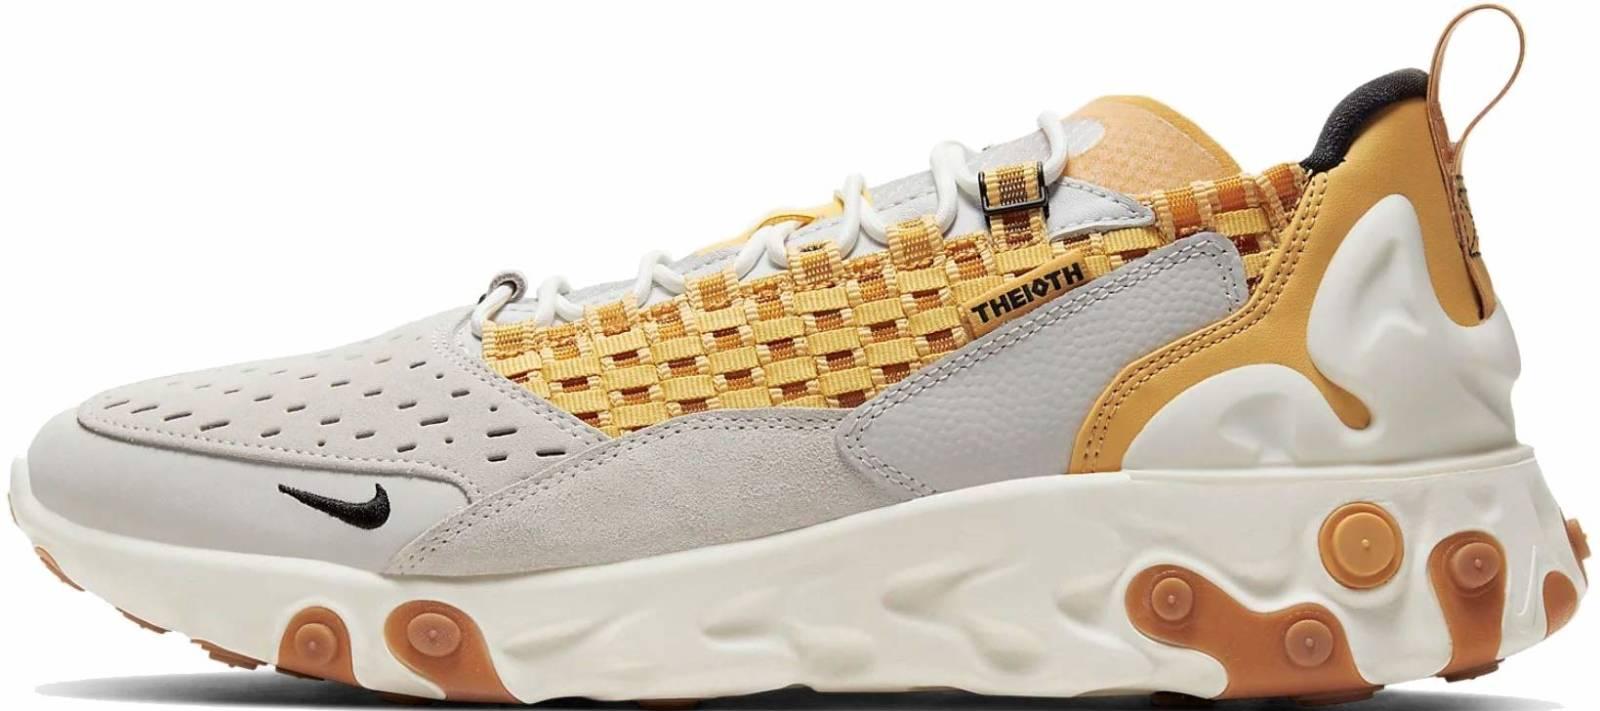 Nike React Sertu sneakers in 4 colors (only $87) | RunRepeat